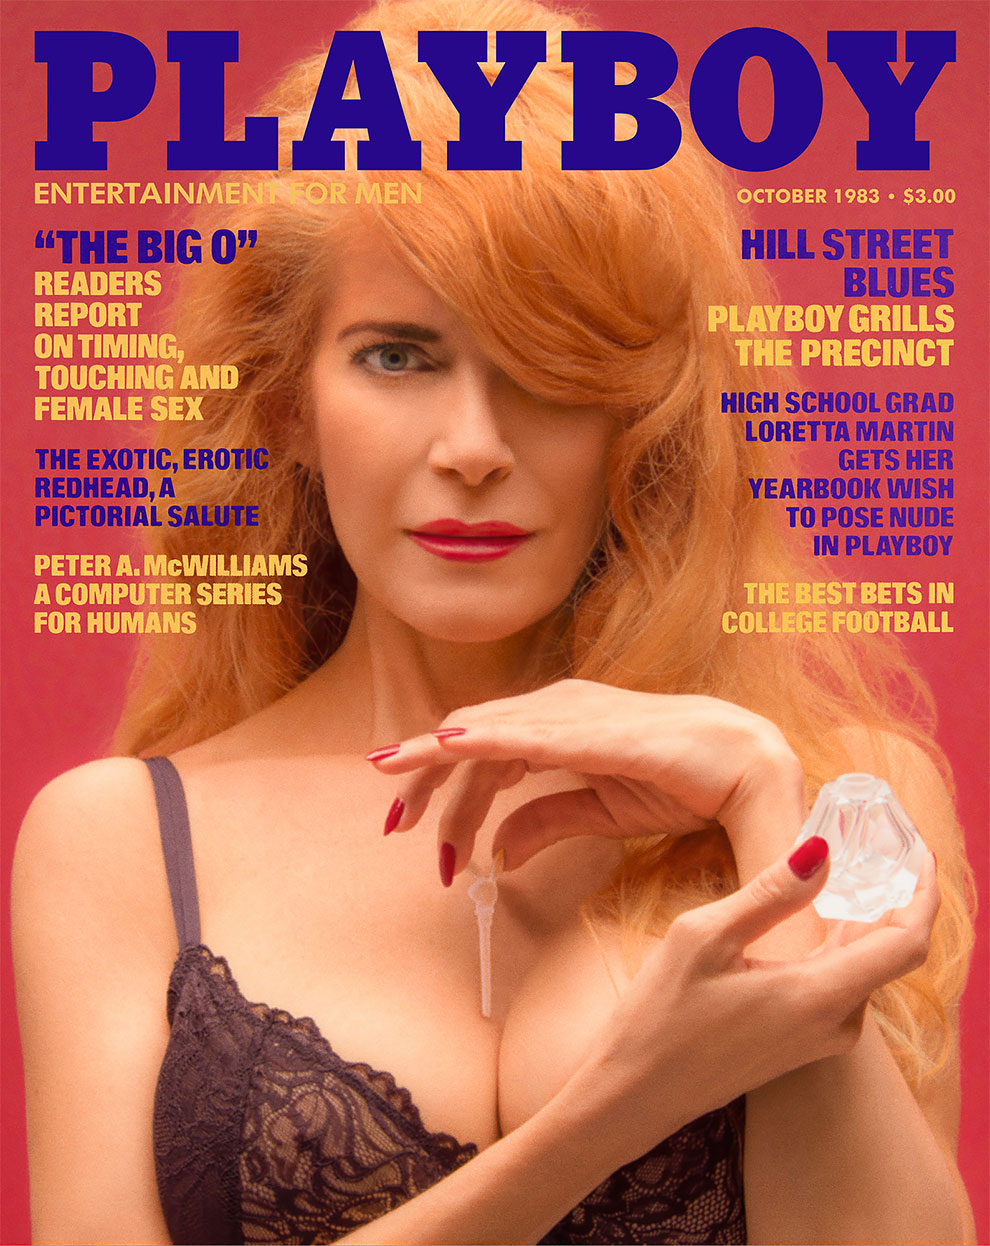 Playboy Playmates 30 anos despues 6